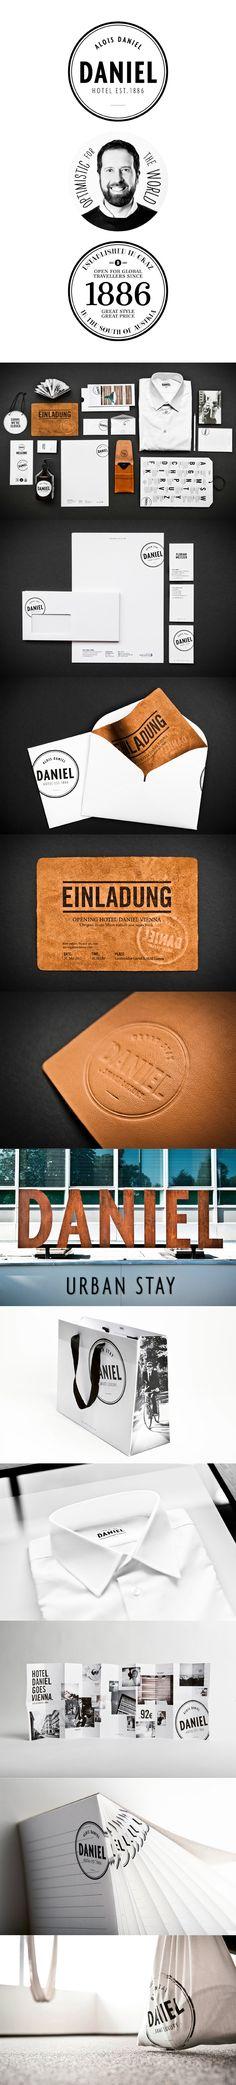 Hotel Daniel by Moodley Brand Identity. #packaging #branding #marketing. PD